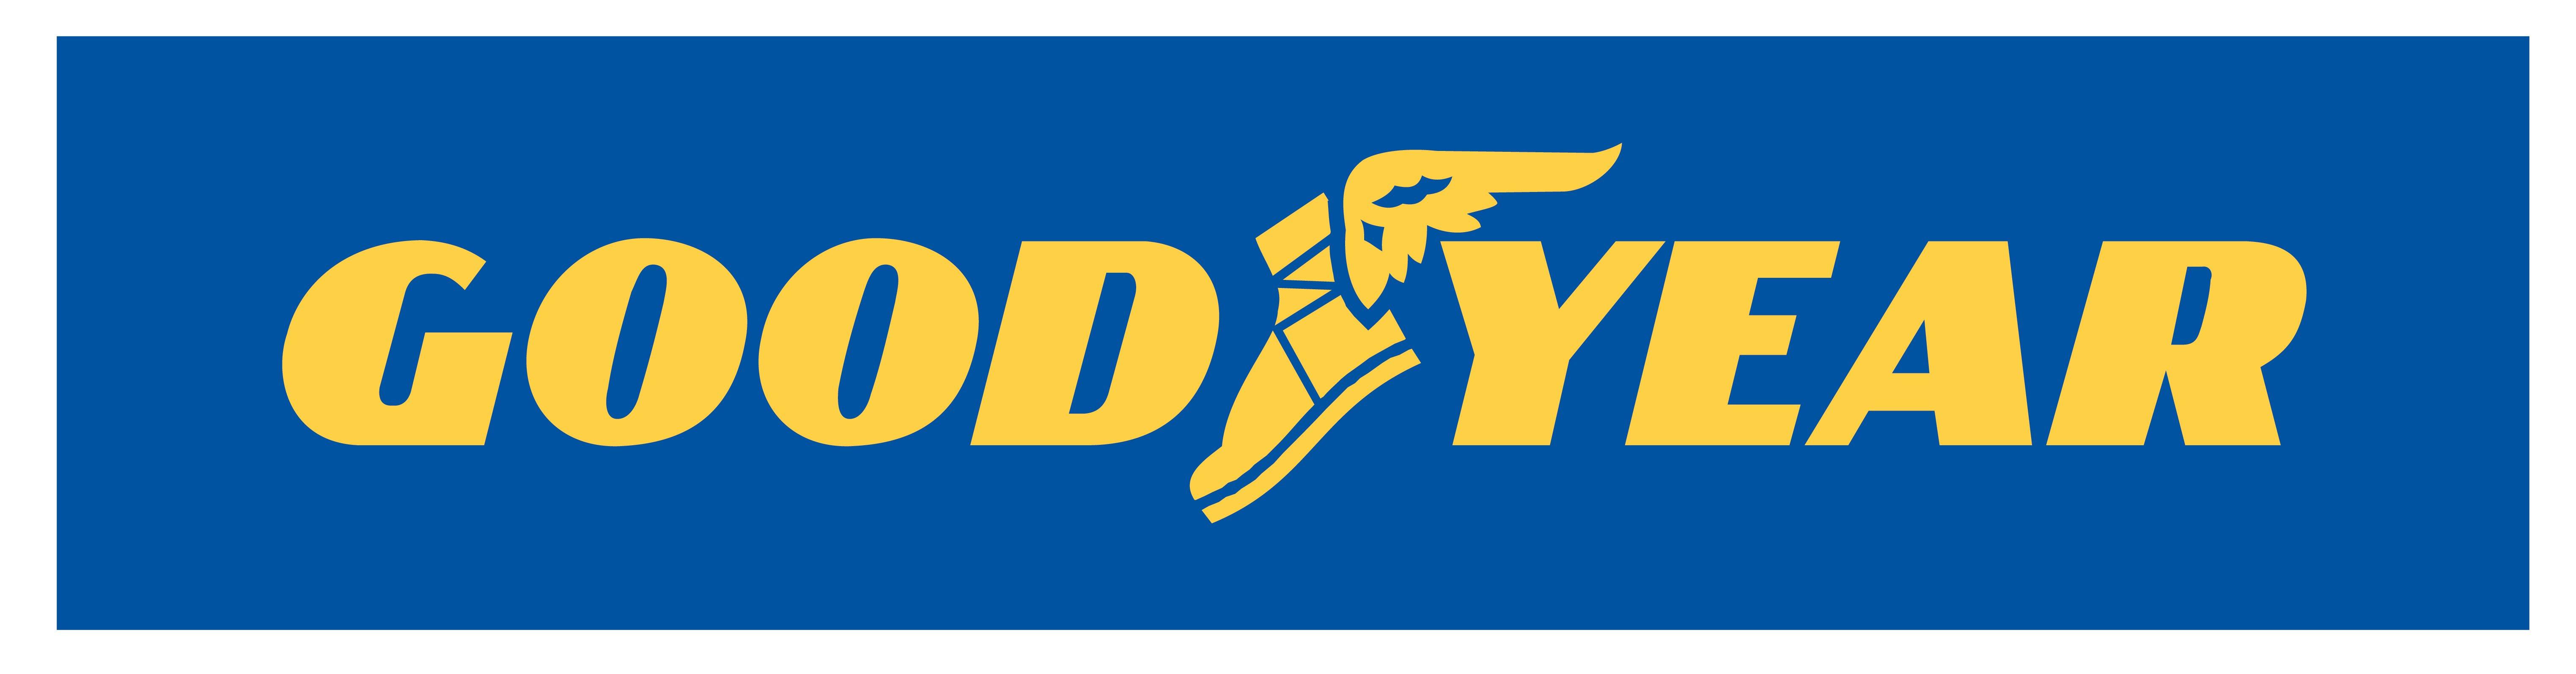 Kormoran Logo Tmo. Goodyear | ...